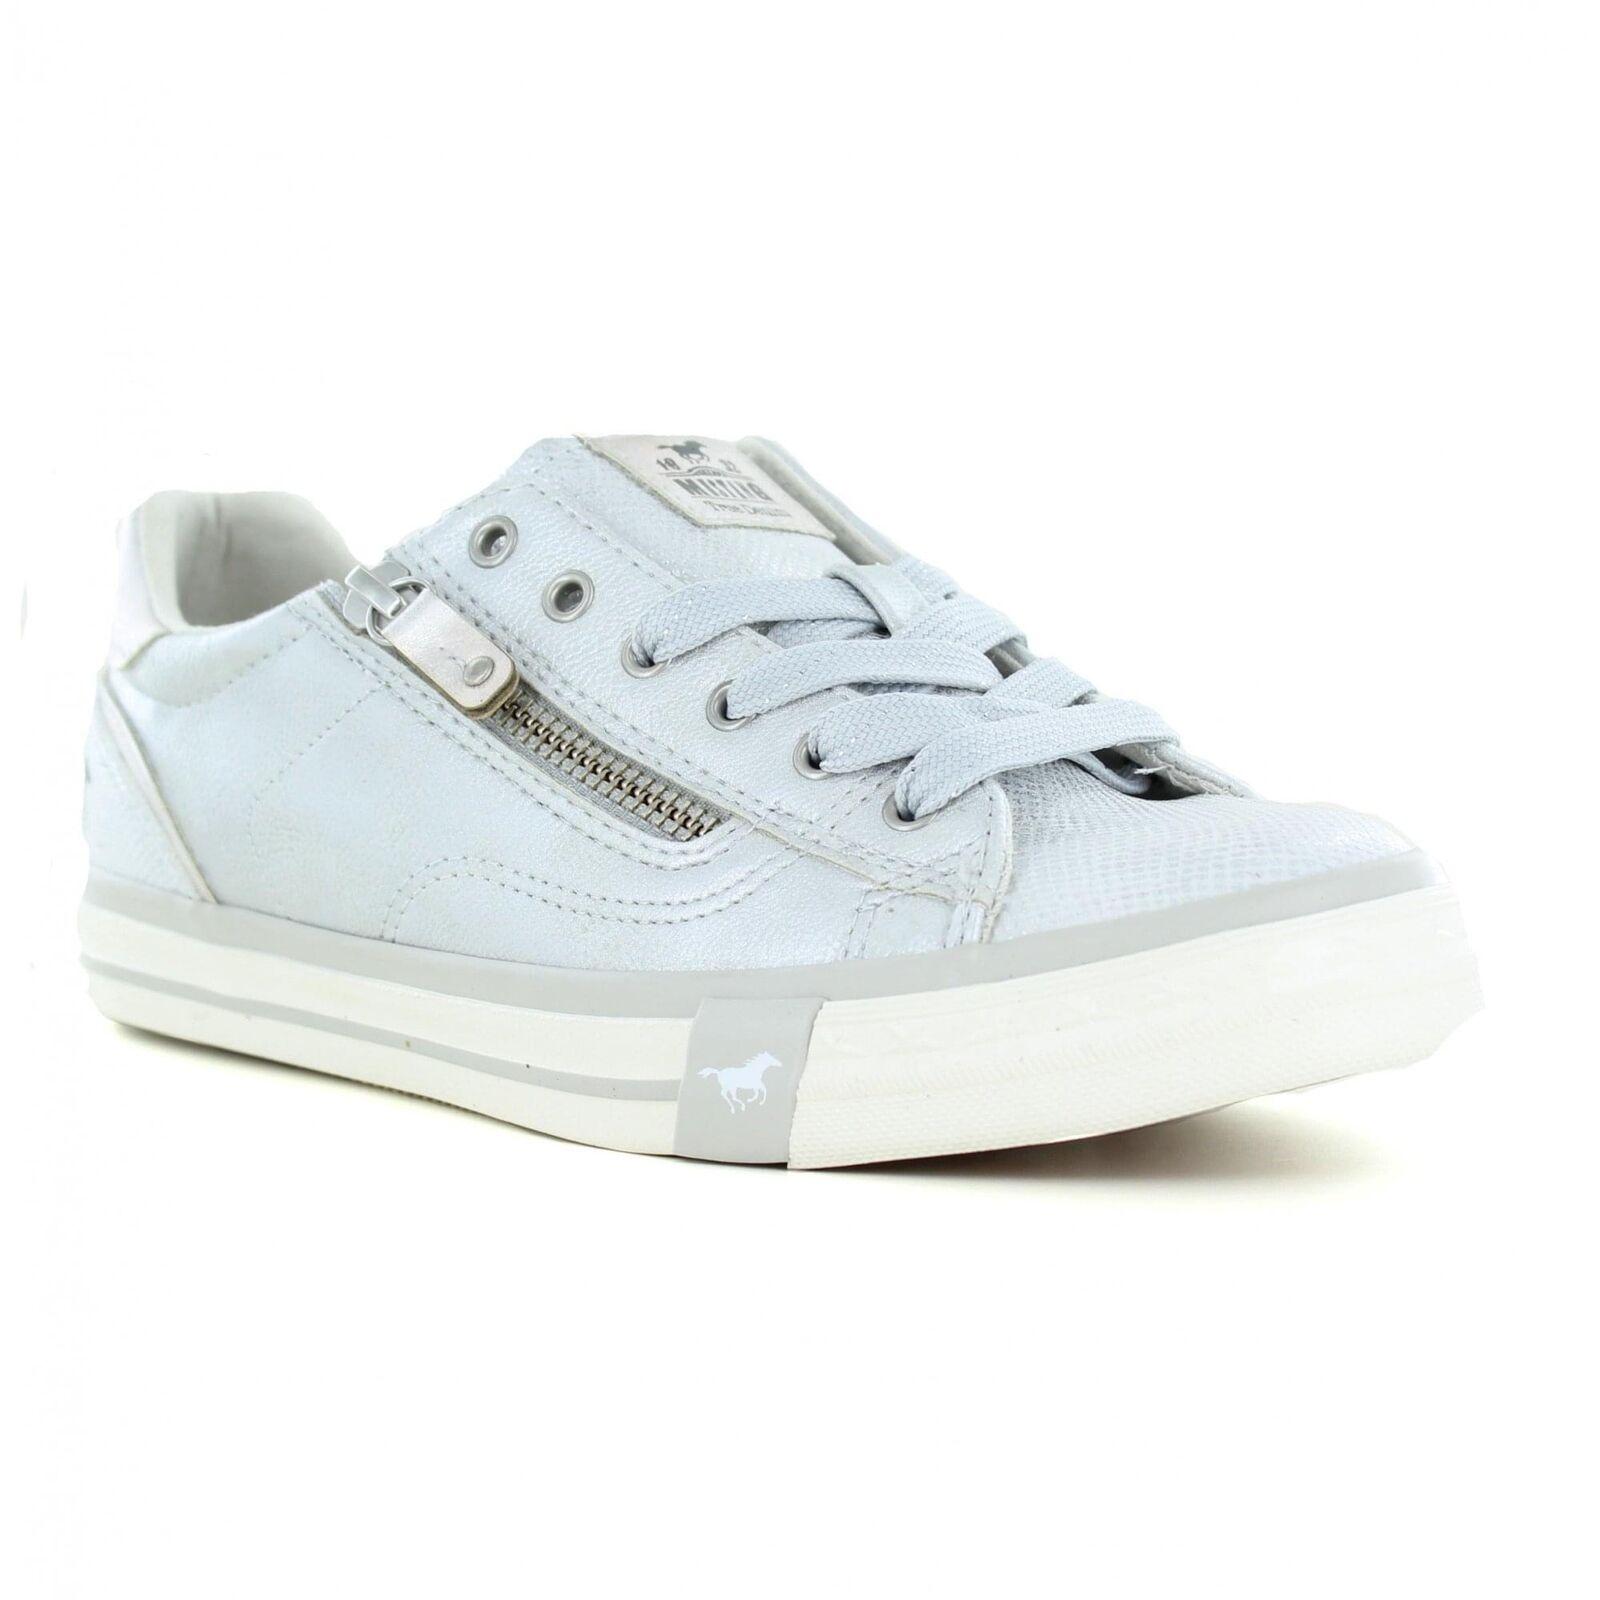 Mustang 1146-311-21 Damenschuhe Fashions Trainers Schuhes - Silver